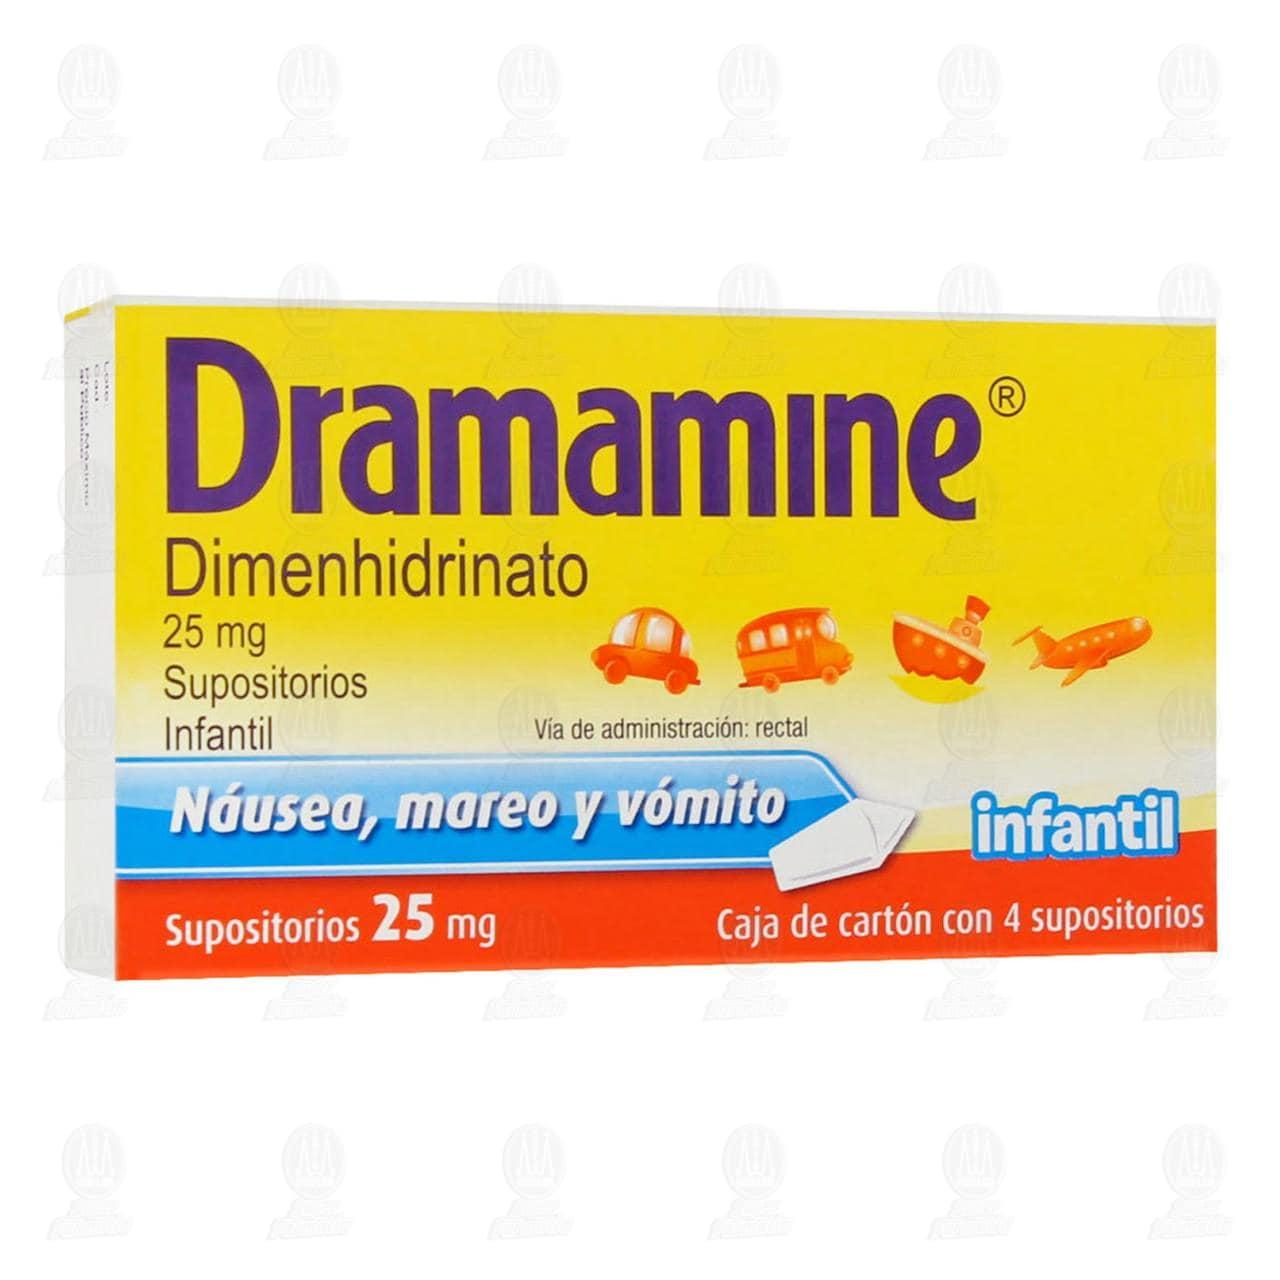 Comprar Dramamine Infantil 25mg 4 Supositorios en Farmacias Guadalajara